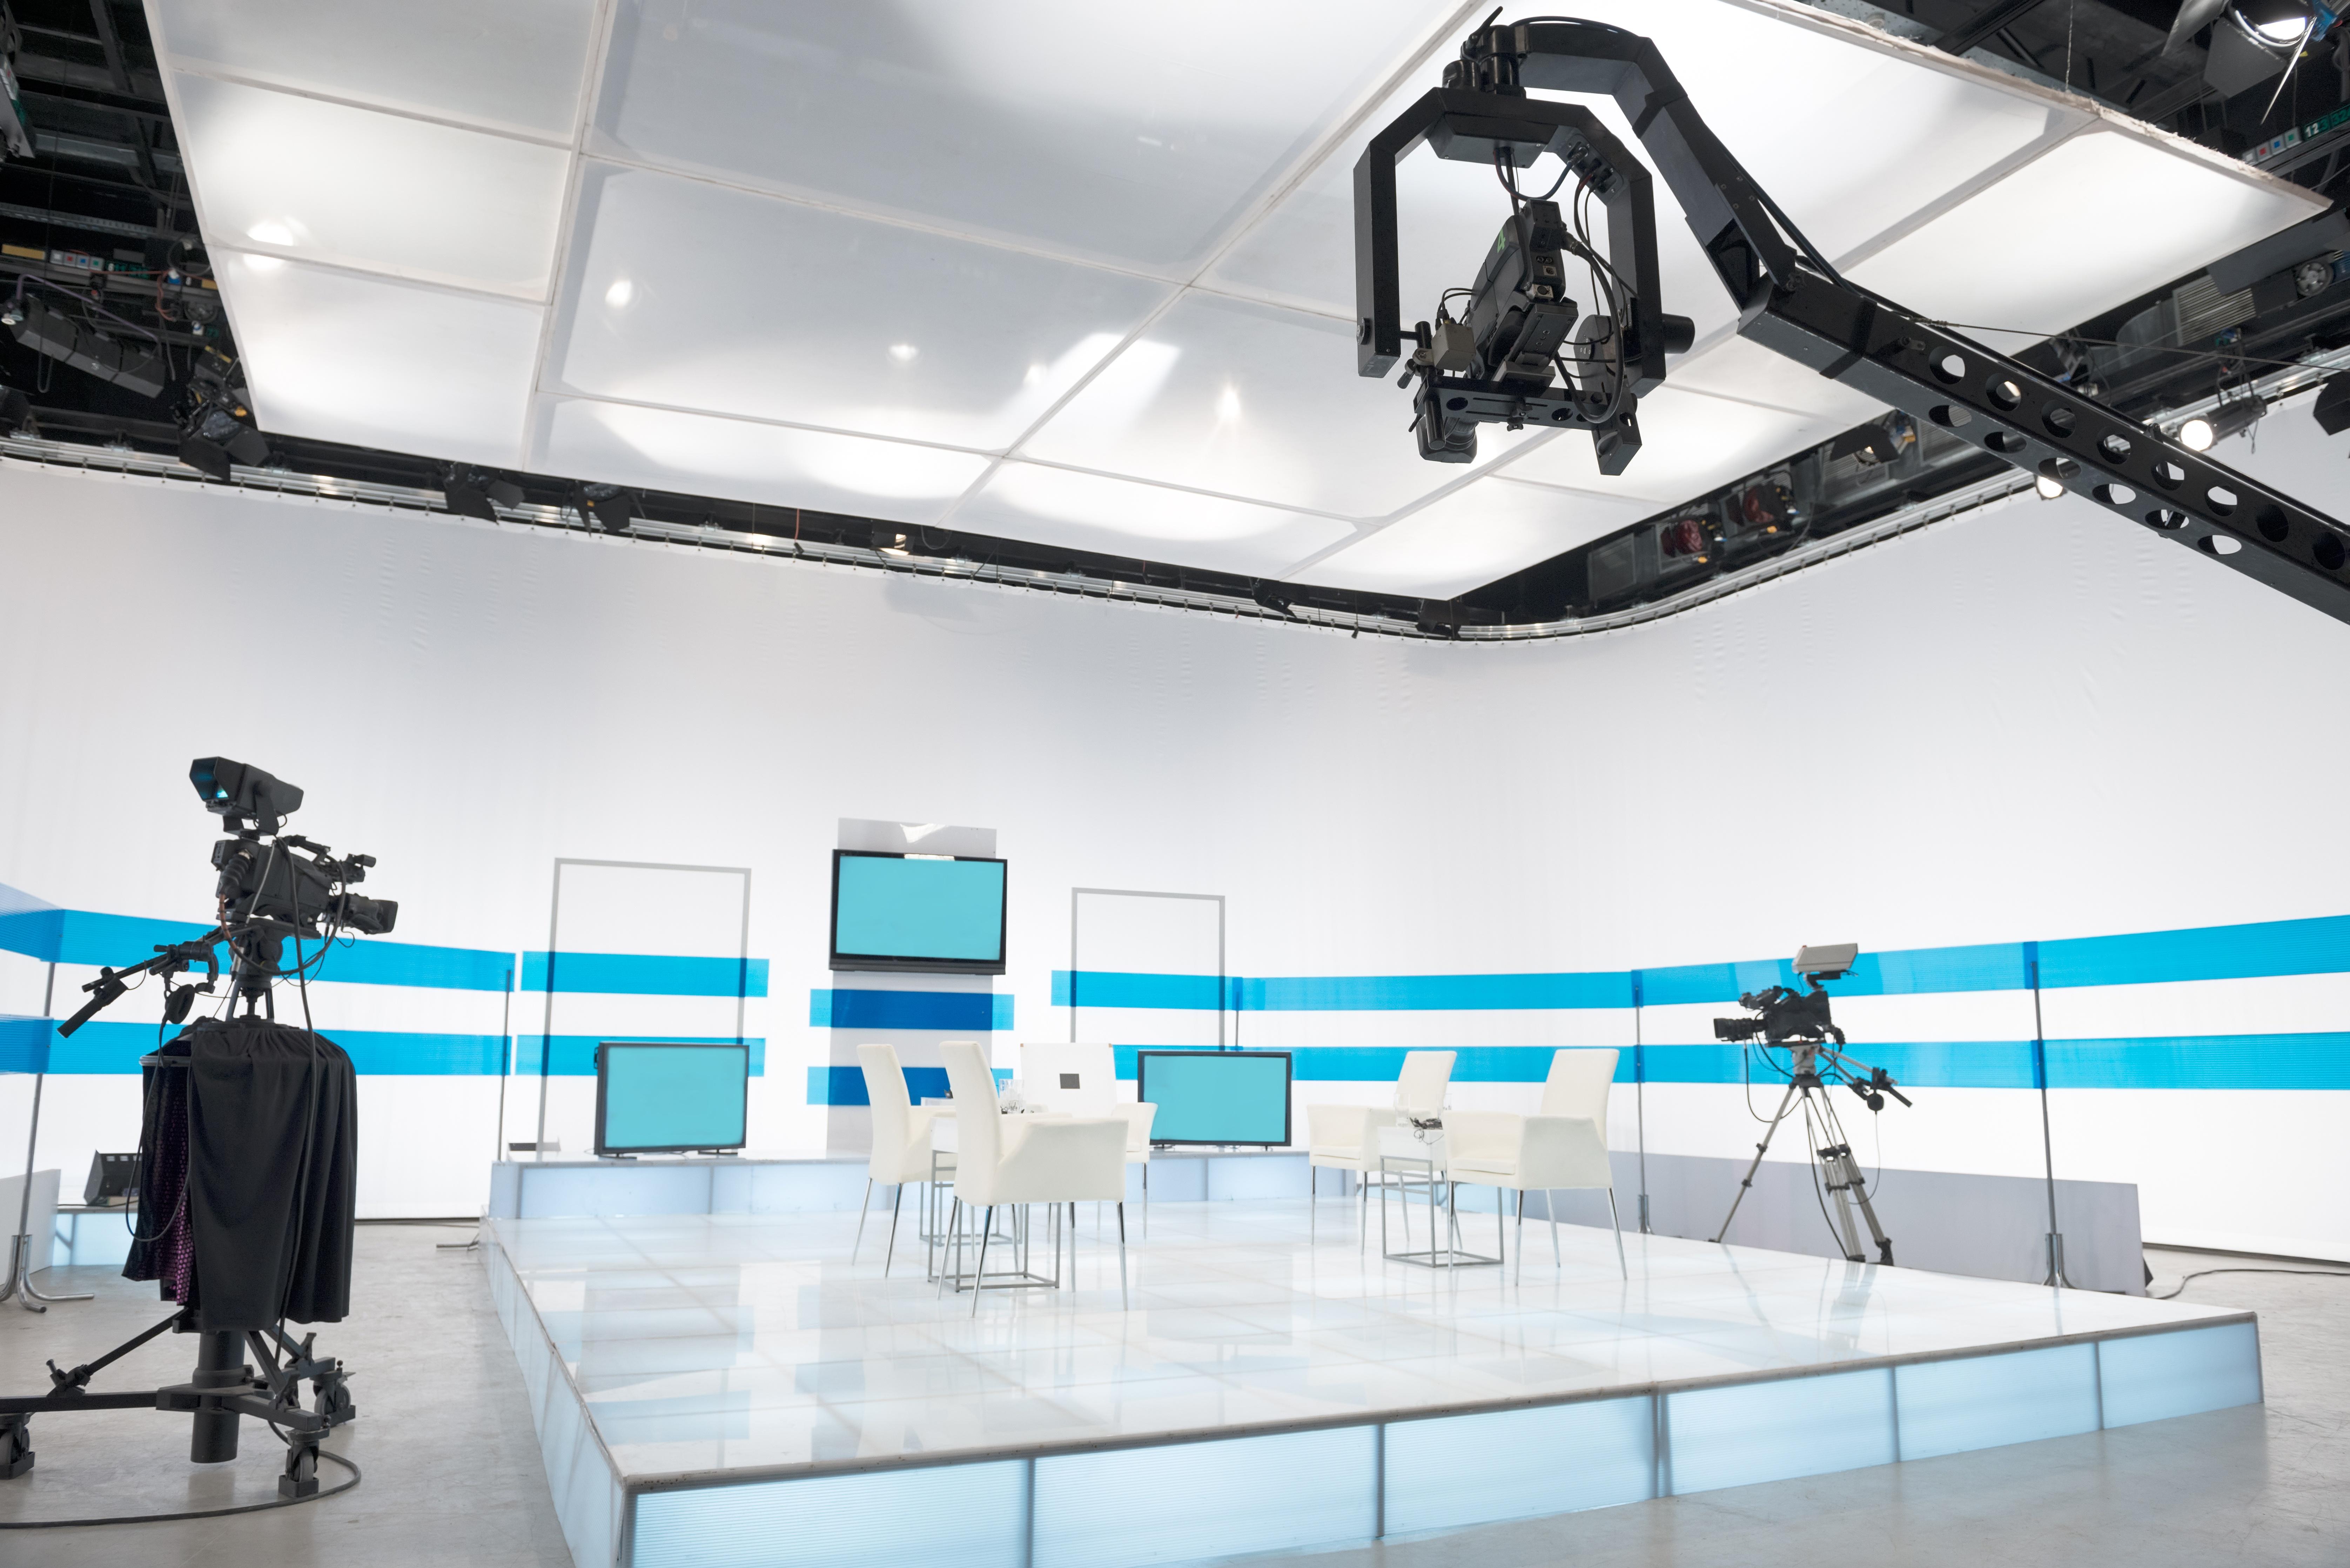 tv_studio_cameras_background_screens_lighting.jpg